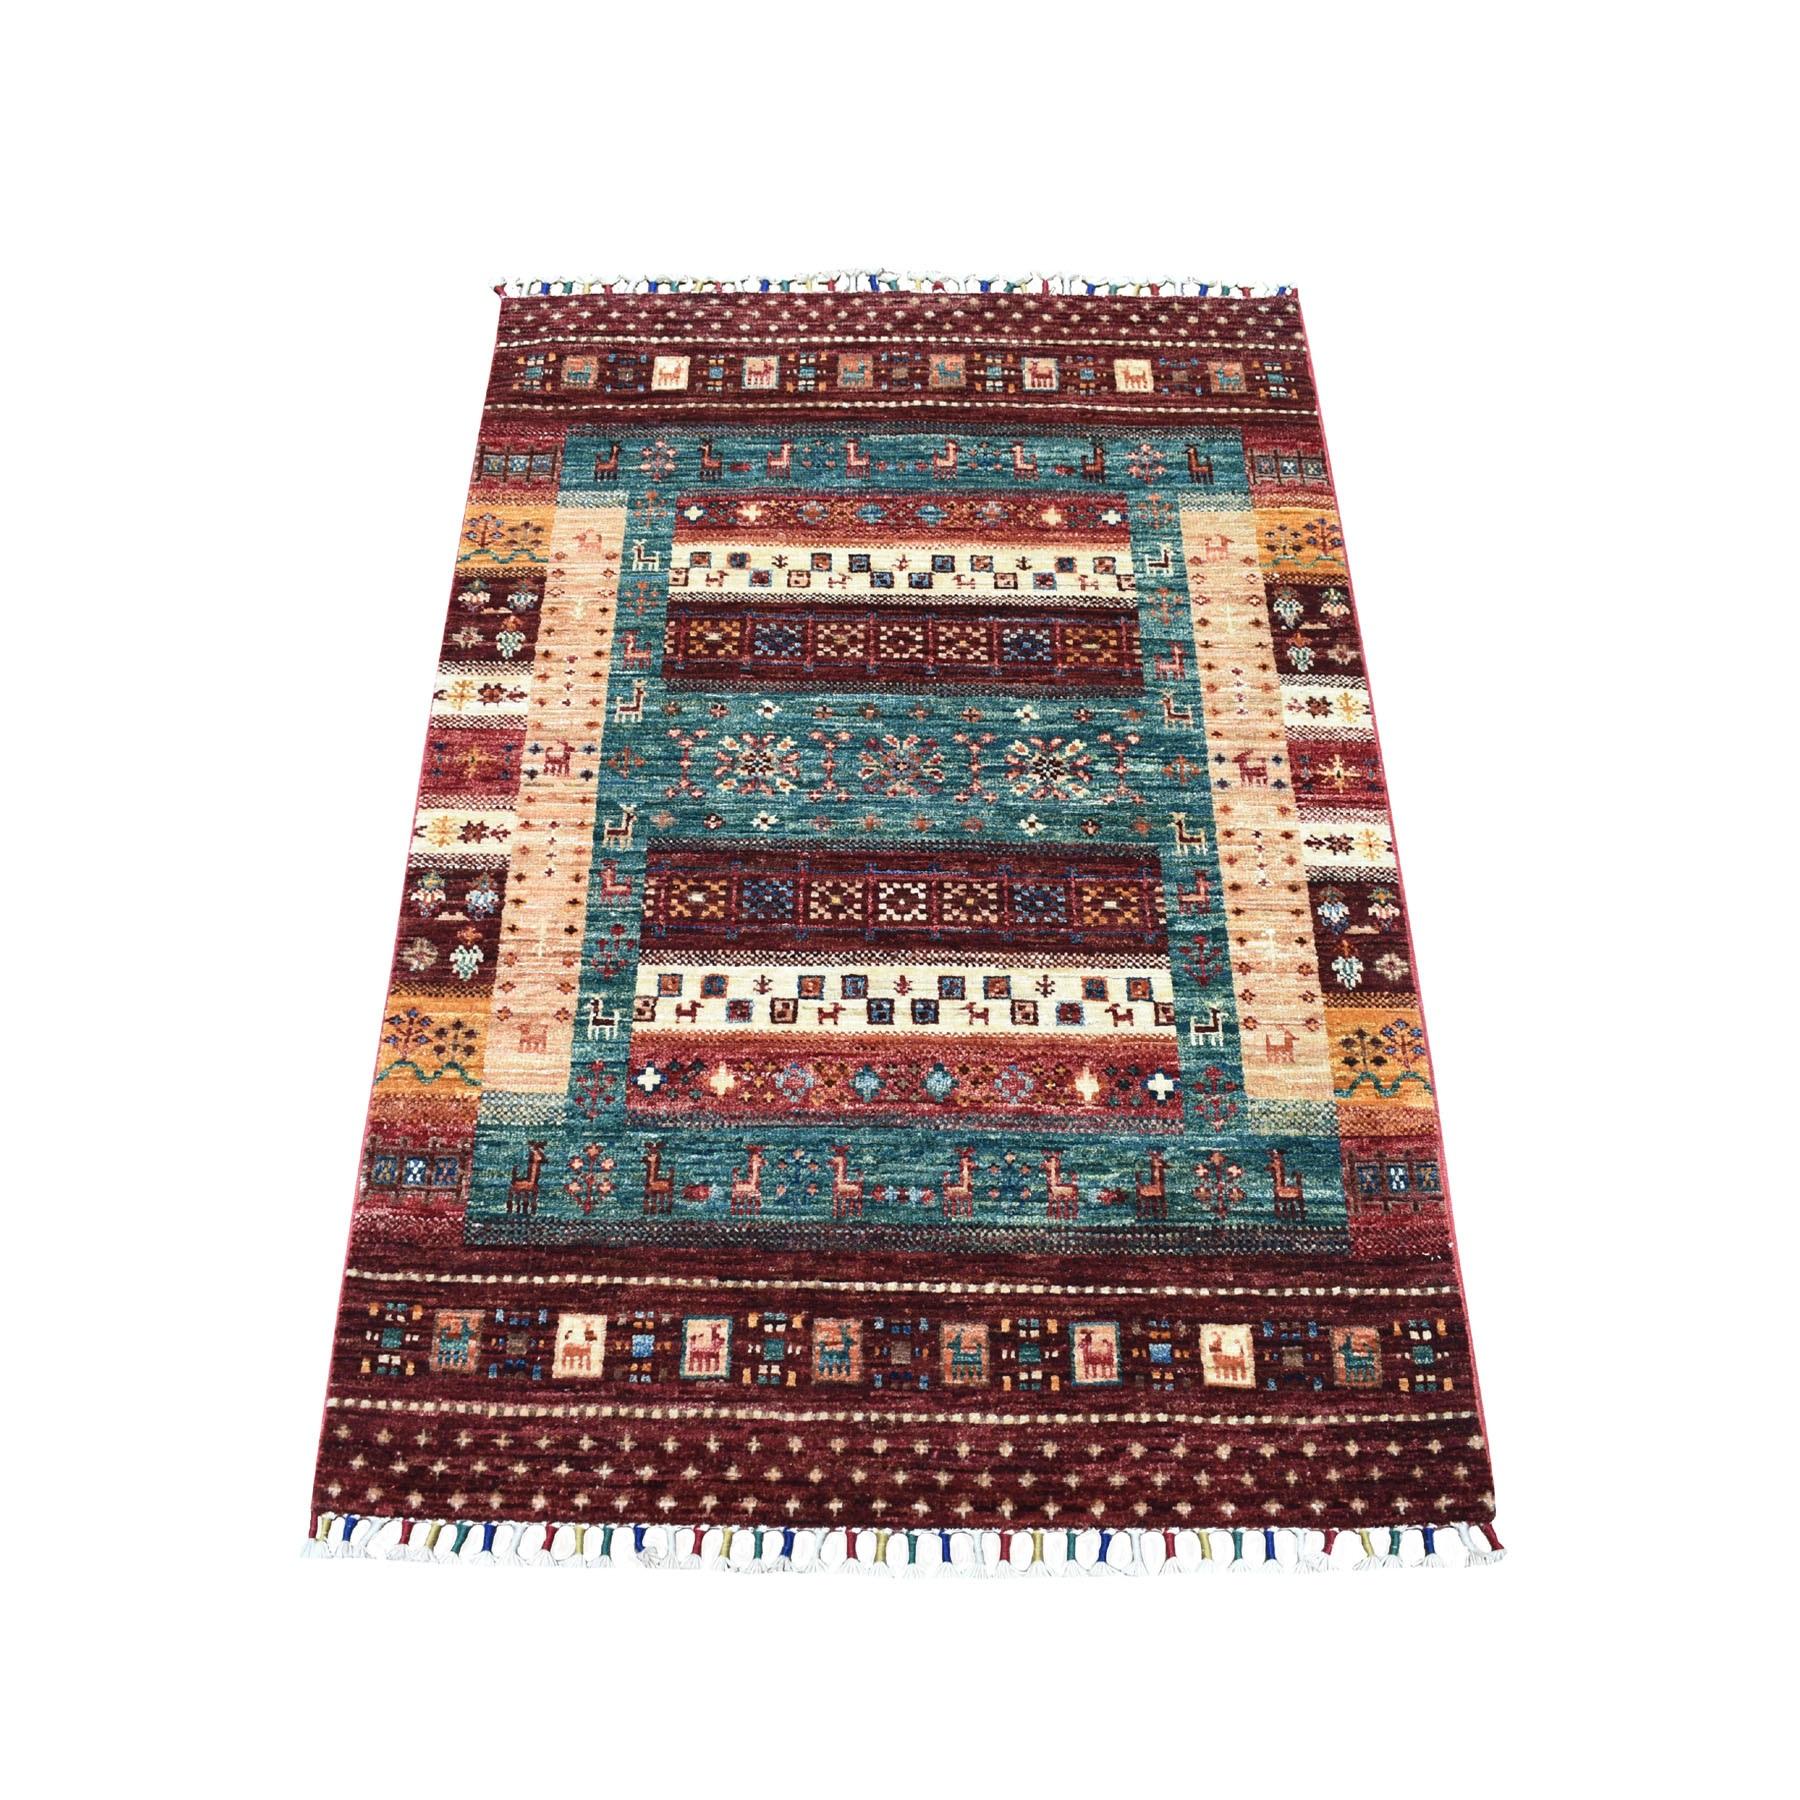 "2'8""X4' Red Kashkuli Design Super Kazak Pictorial Hand Knotted Pure Wool Oriental Rug moaeb89c"